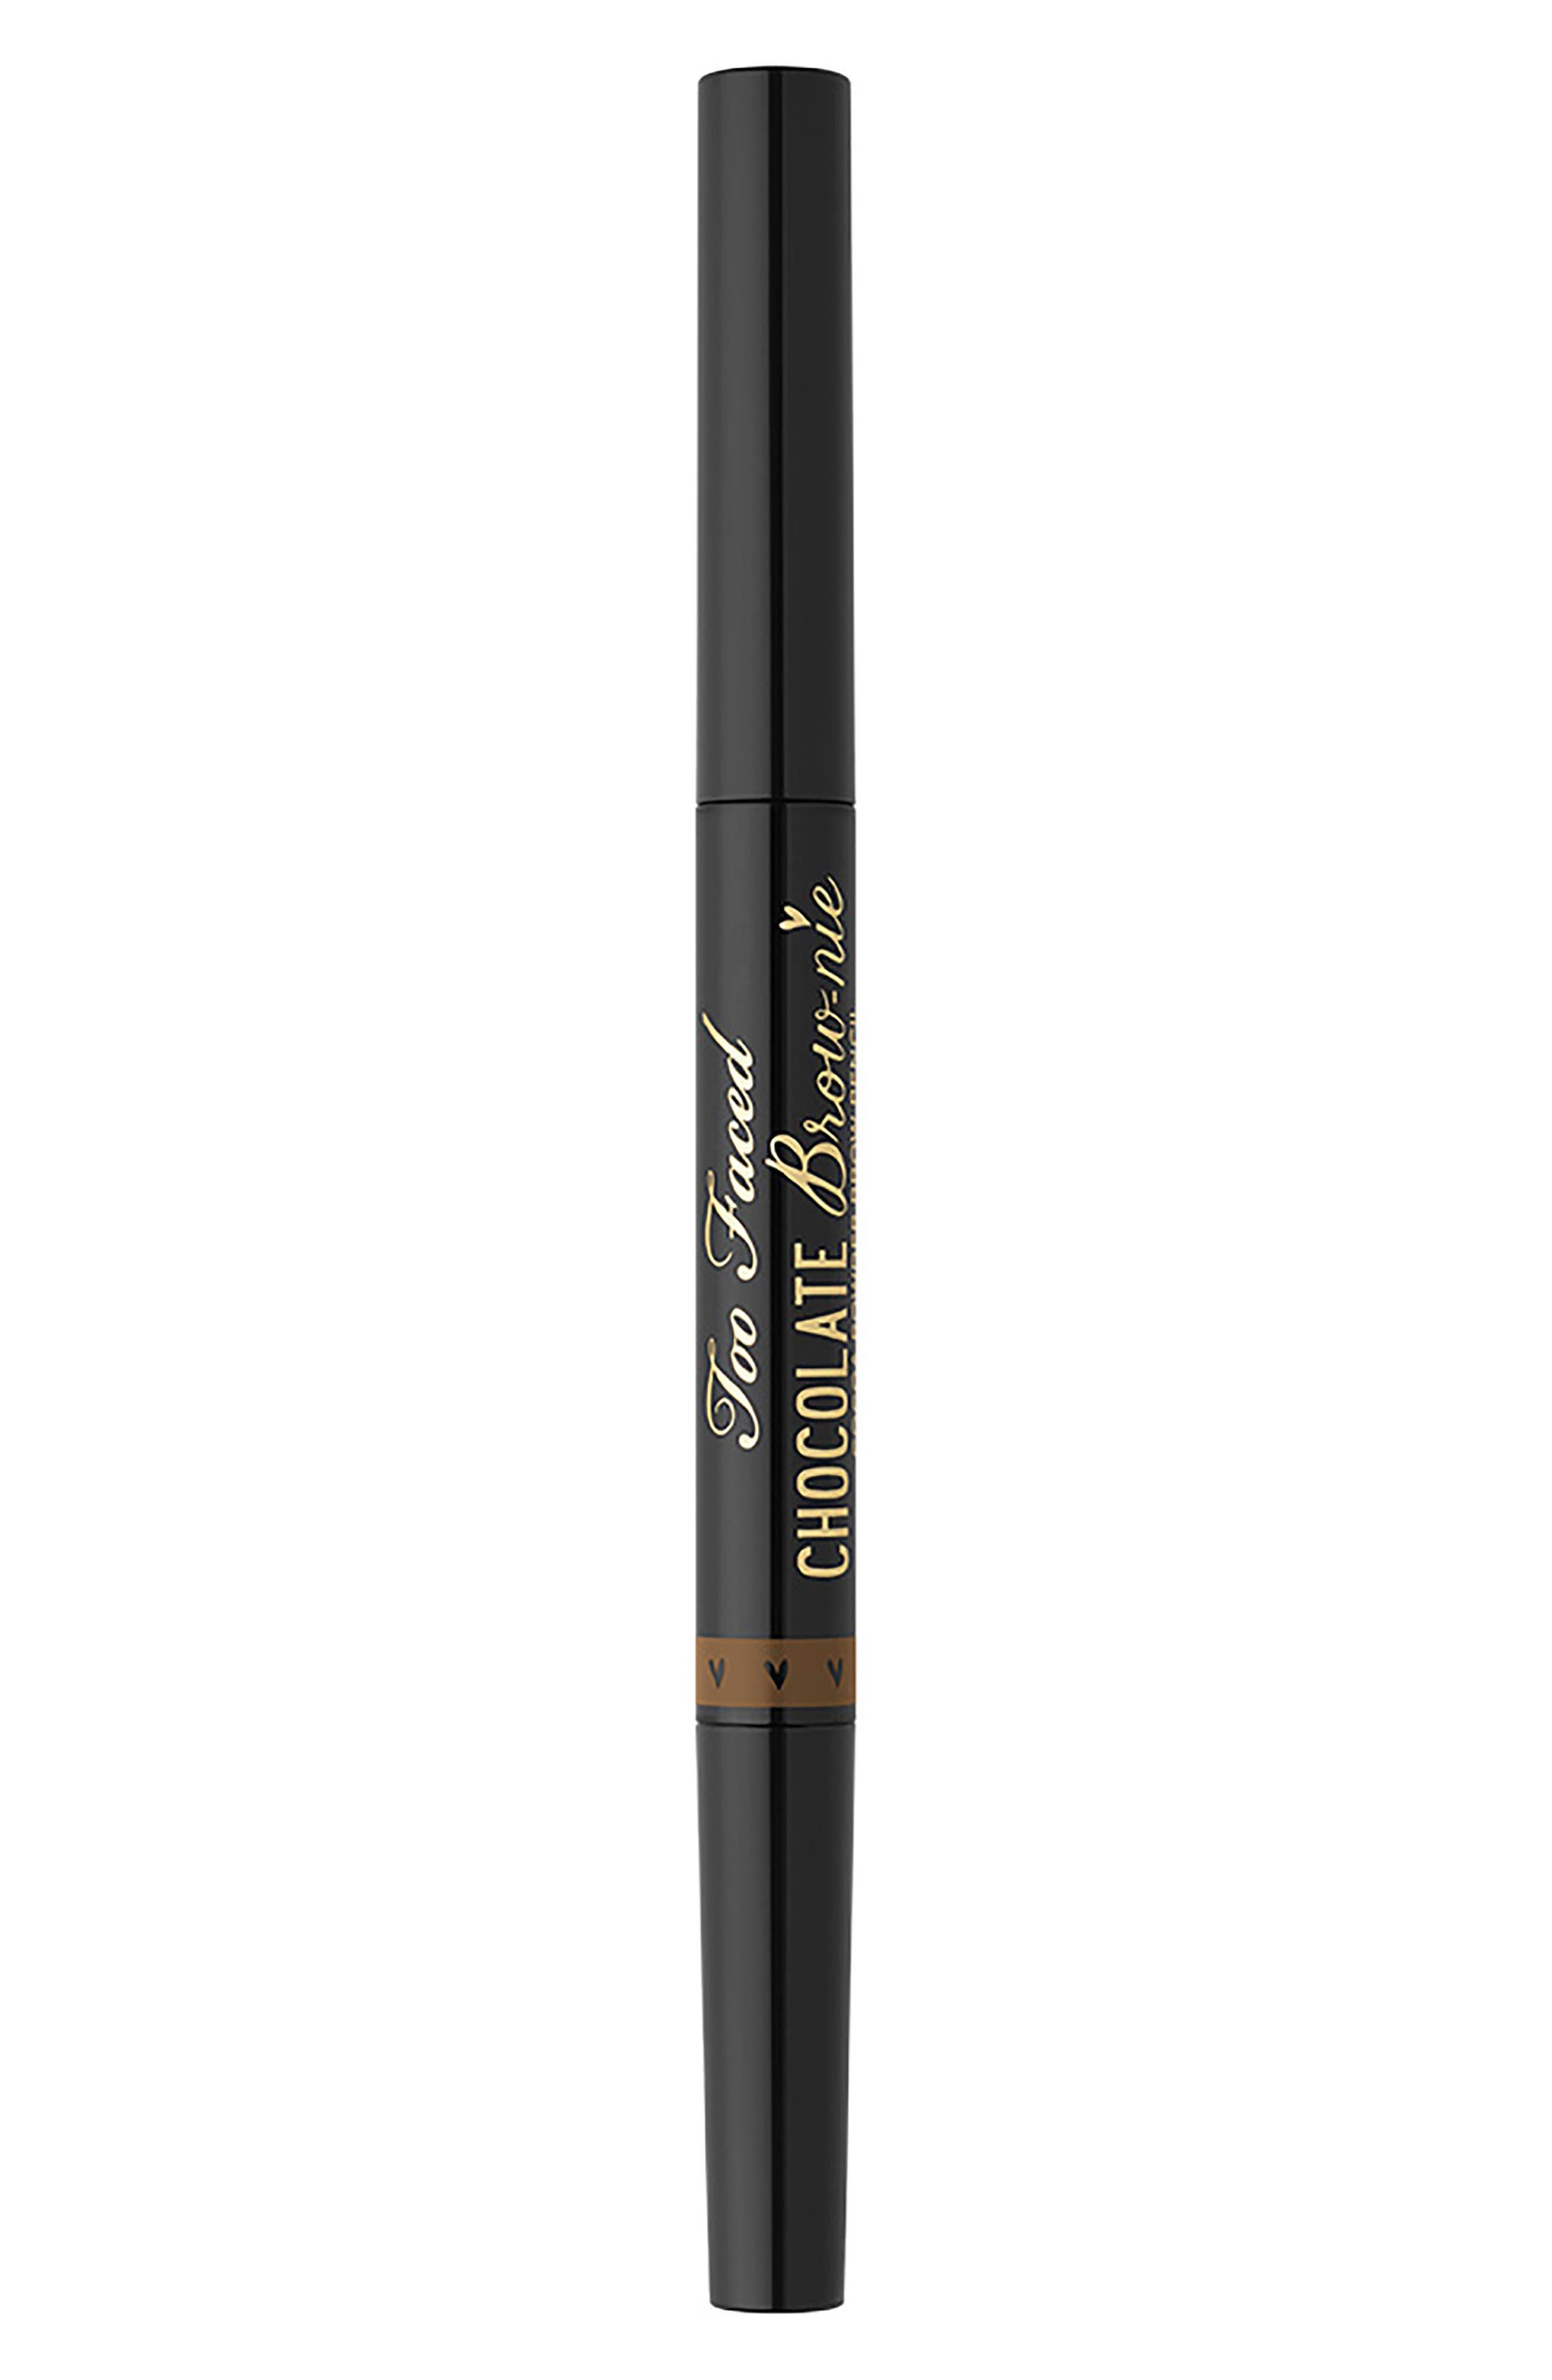 Chocolate Brow-nie Cocoa Powder Brow Pencil,                         Main,                         color, SOFT BROWN